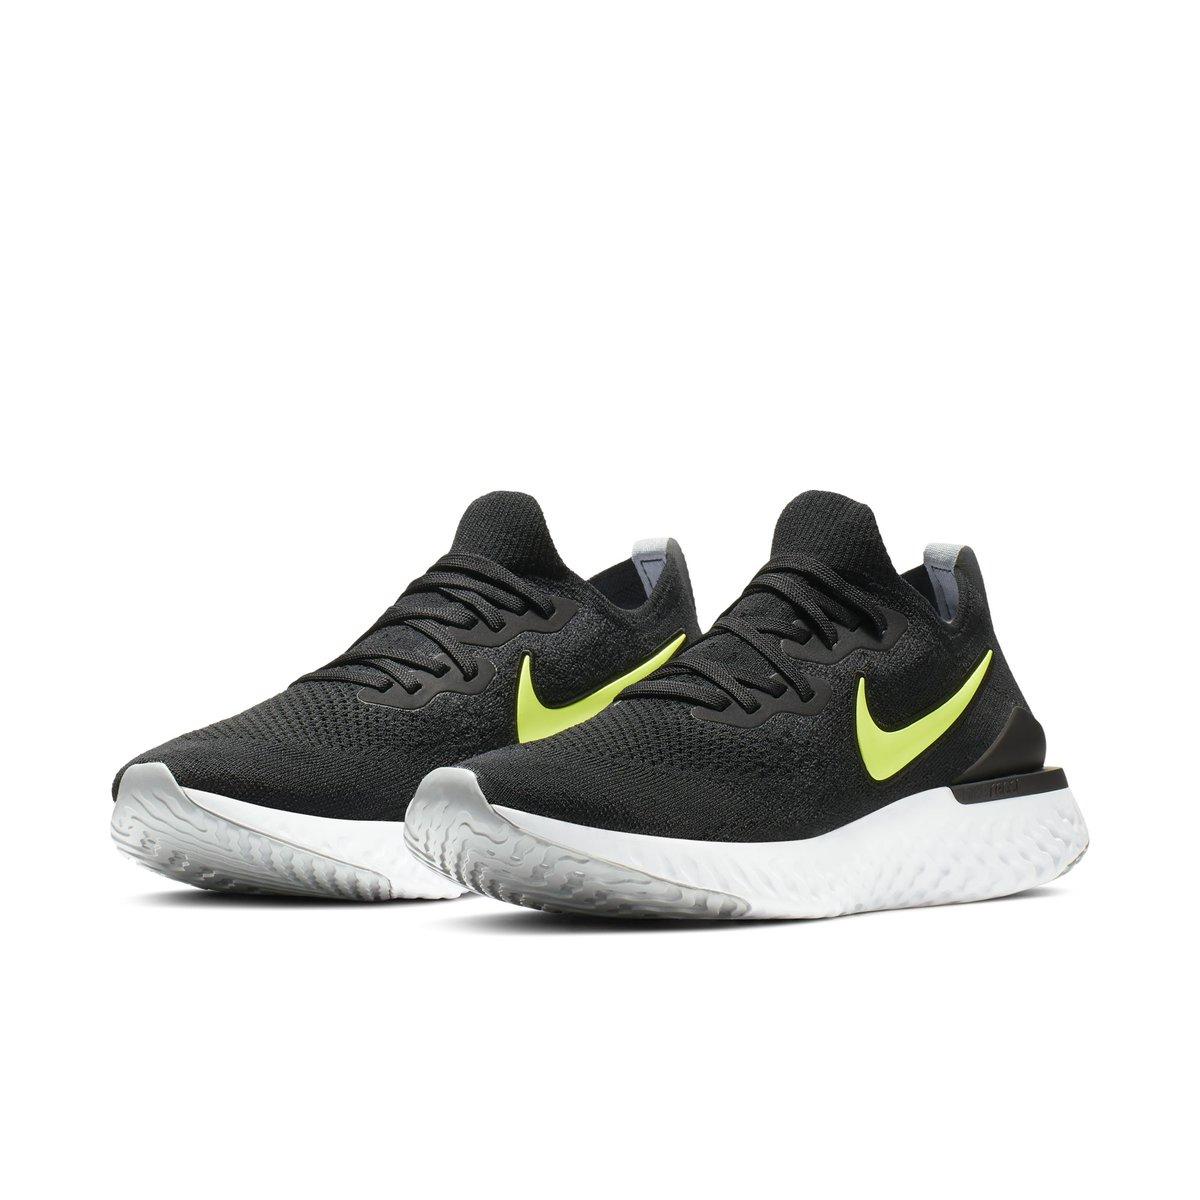 Nike,Epic React Flyknit 2,发售  七款配色同时登场!全新 Epic React FK 2 即将发售